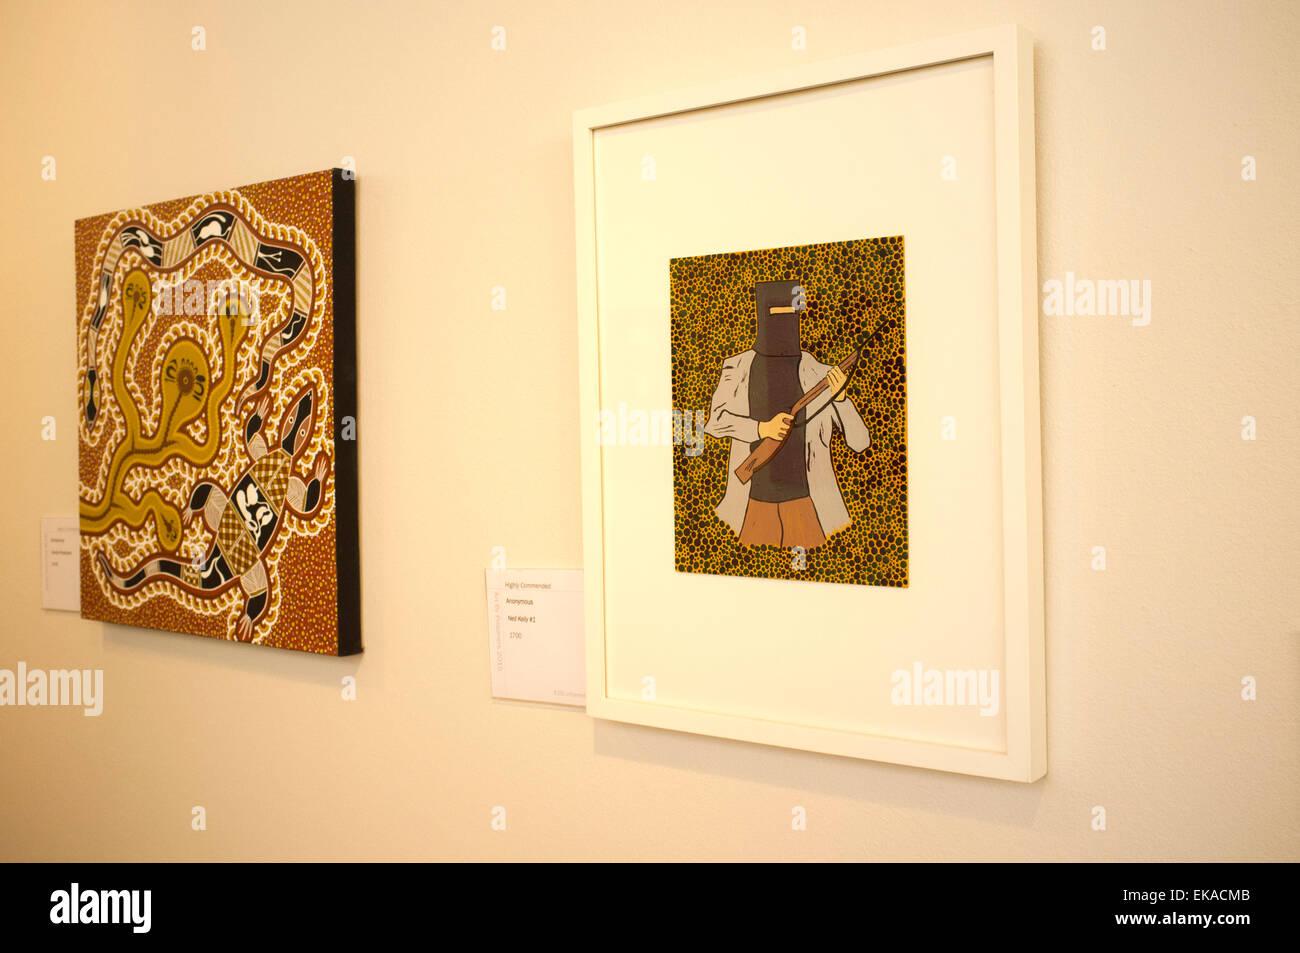 Australian Prison Art Stock Photos & Australian Prison Art Stock ...